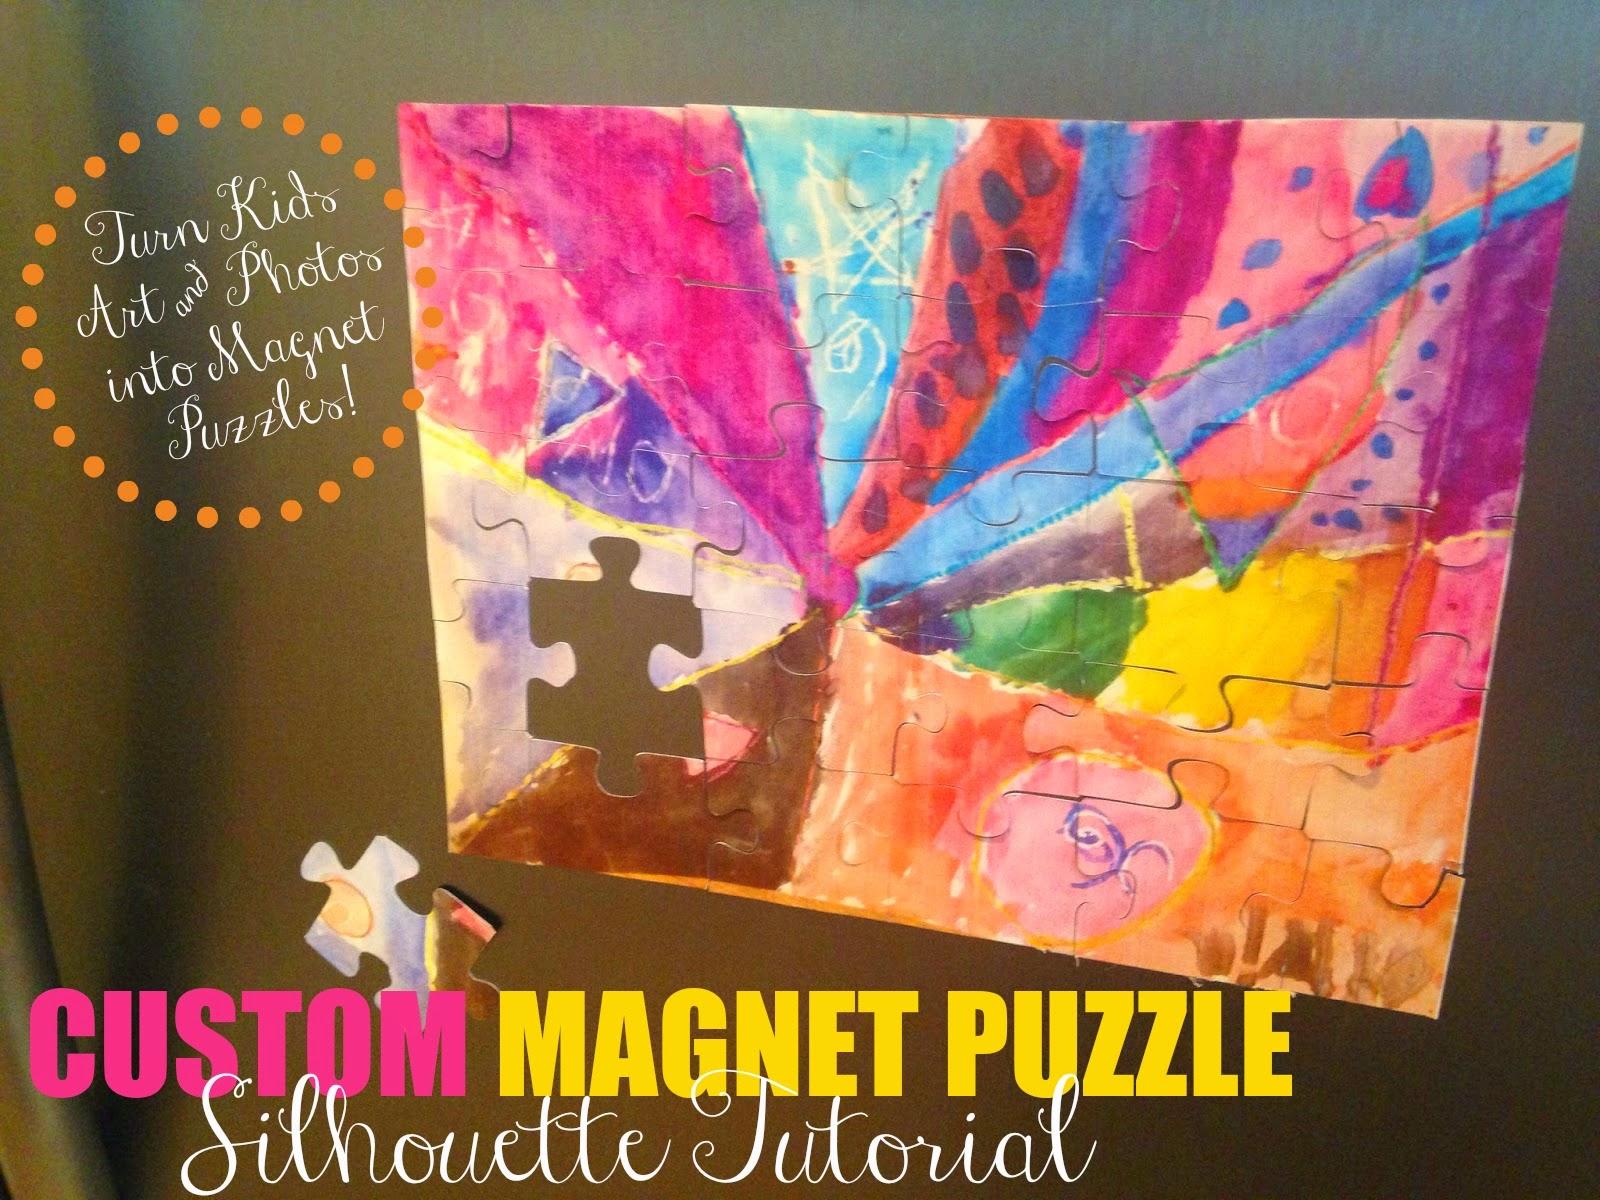 Silhouette tutorial, custom puzzle magnet, DIY, do it yourself